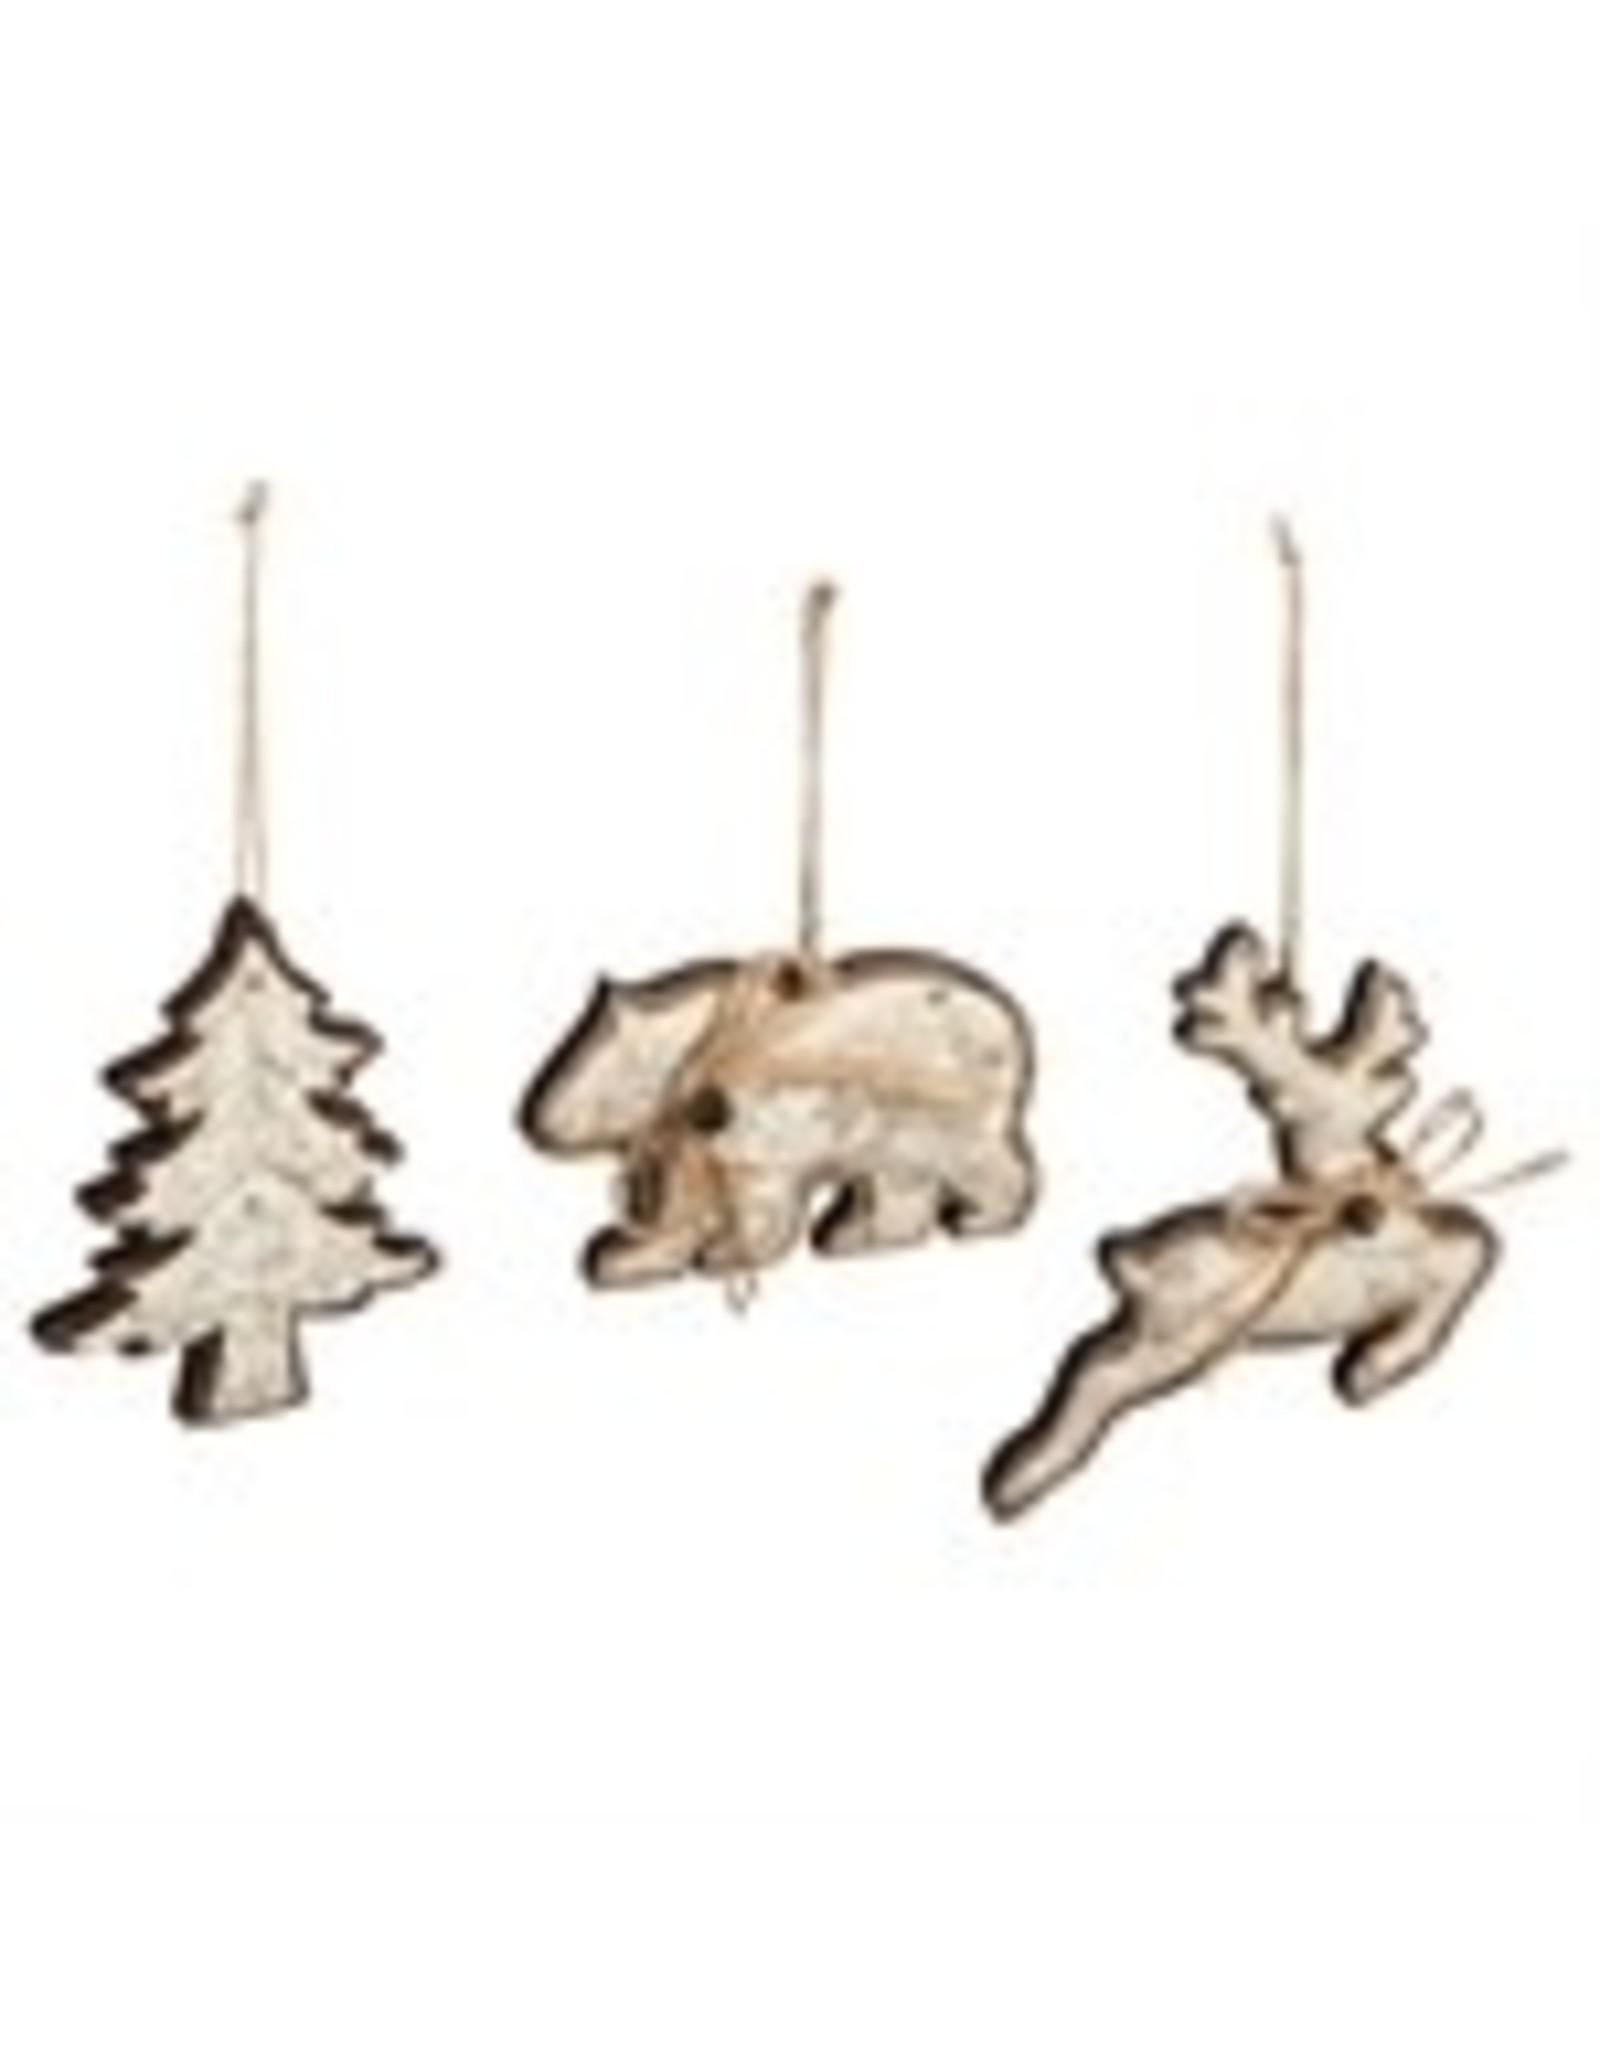 Evergreen Enterprises Wood & Metal Ornaments w/Jute Bow,Light Brown